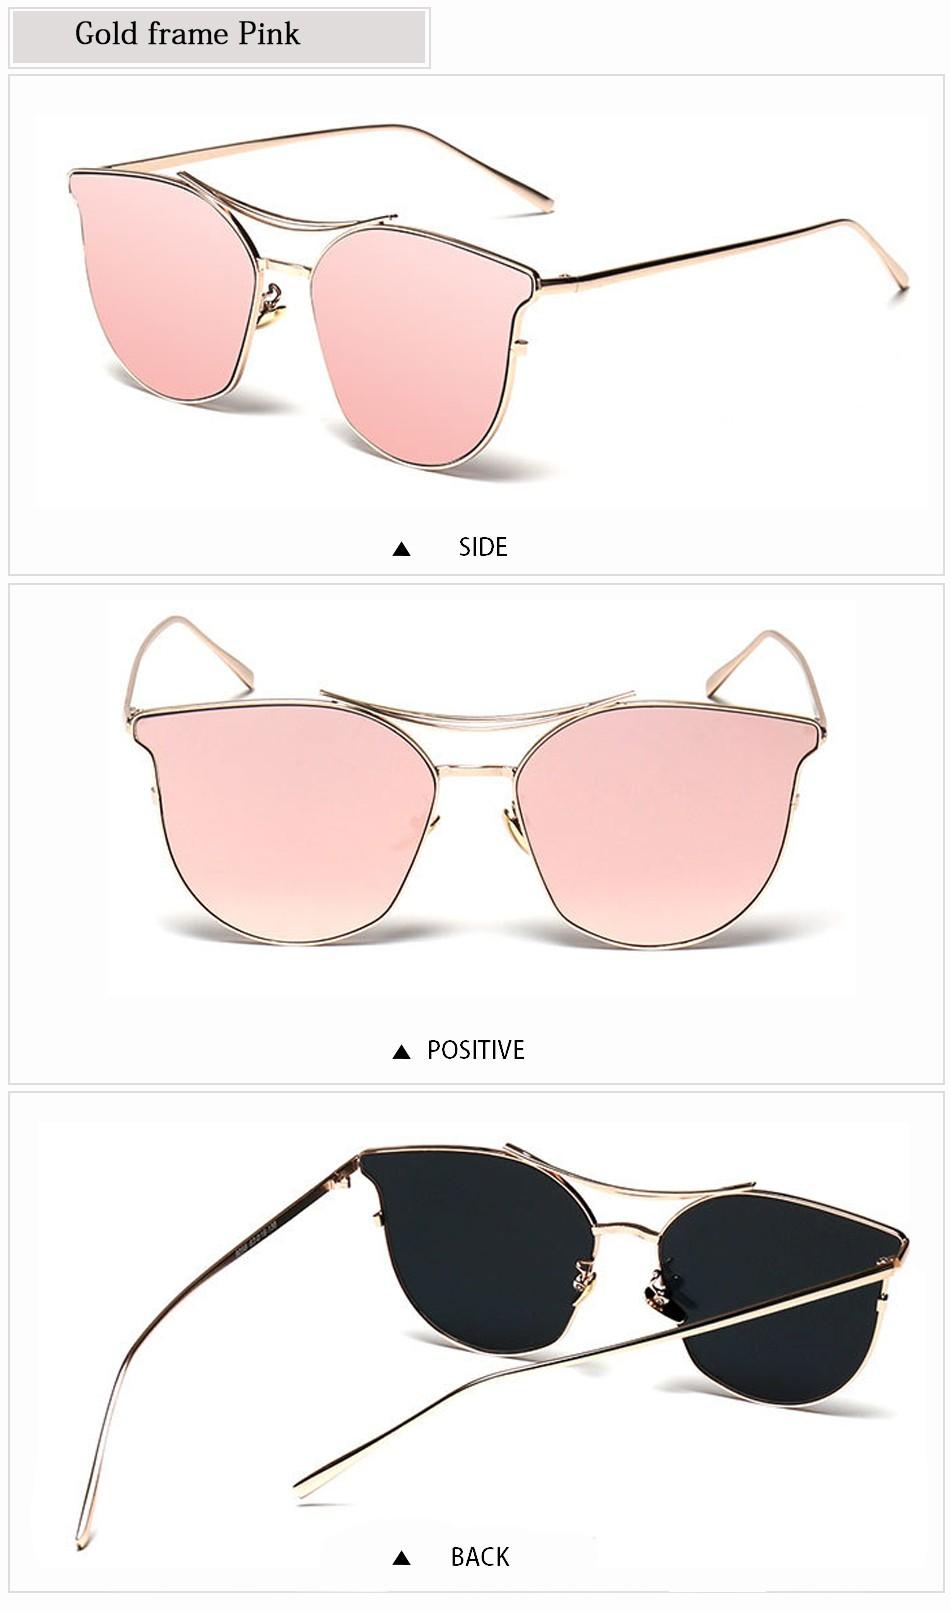 3859e450f6 FEIDU New Cat Eye Aviator Sunglasses Women Vintage Fashion Metal Frame Mirror  Sun Glasses Summer Style Ladies Sunglasses UV400. 1 2 3 4 5 6 07 08 09 010  ...